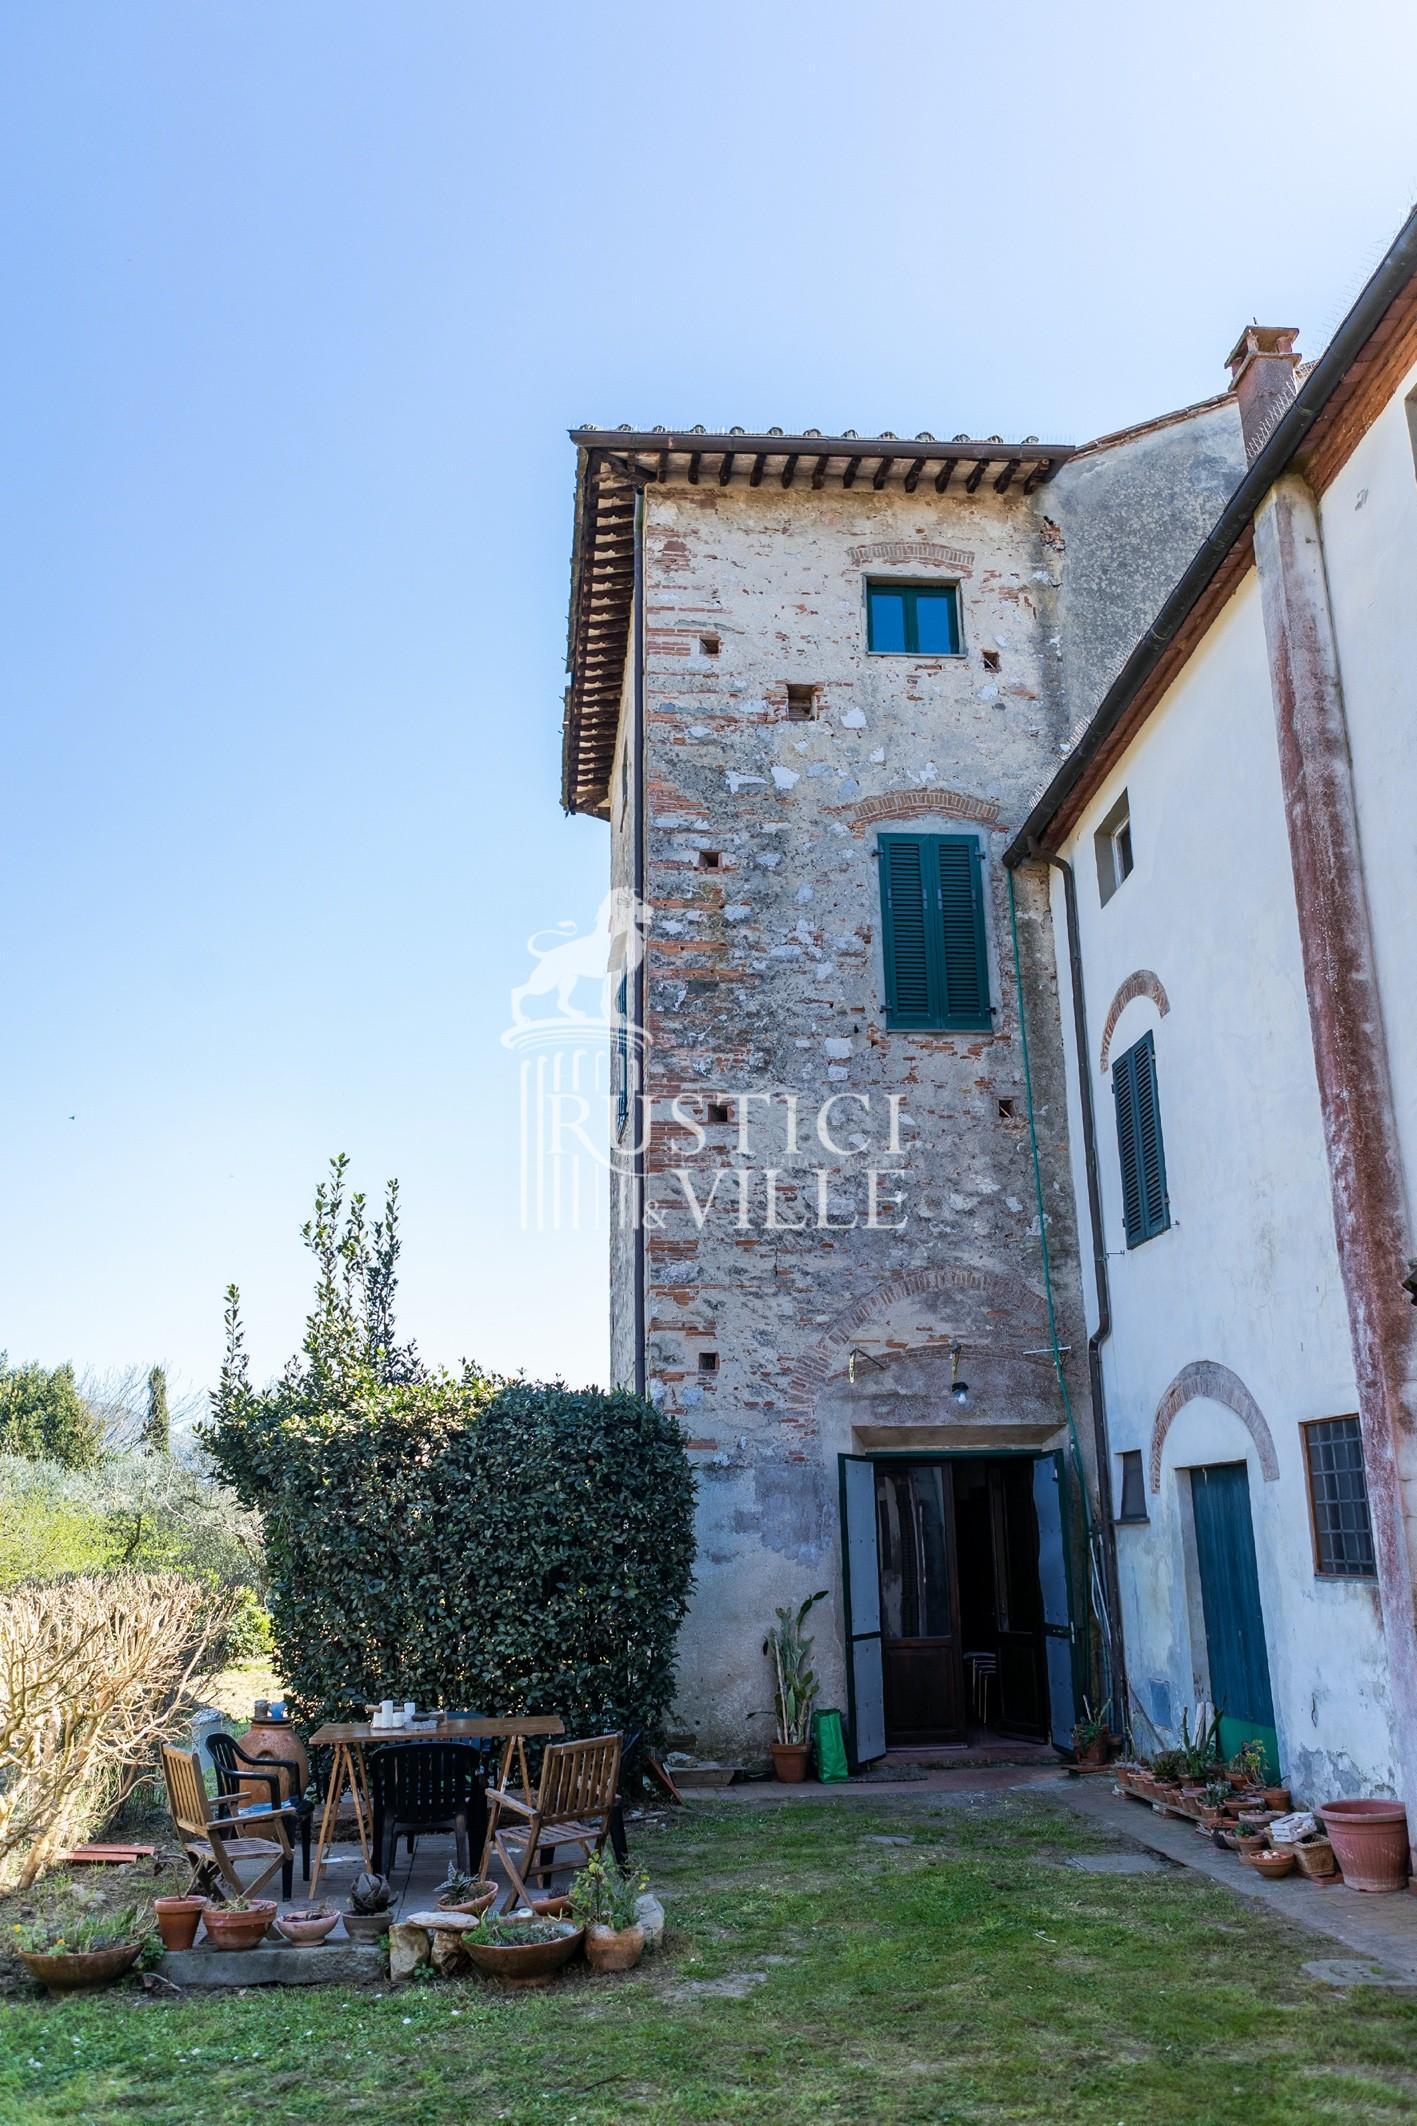 Edificio storico in vendita a San Giuliano Terme (3/81)